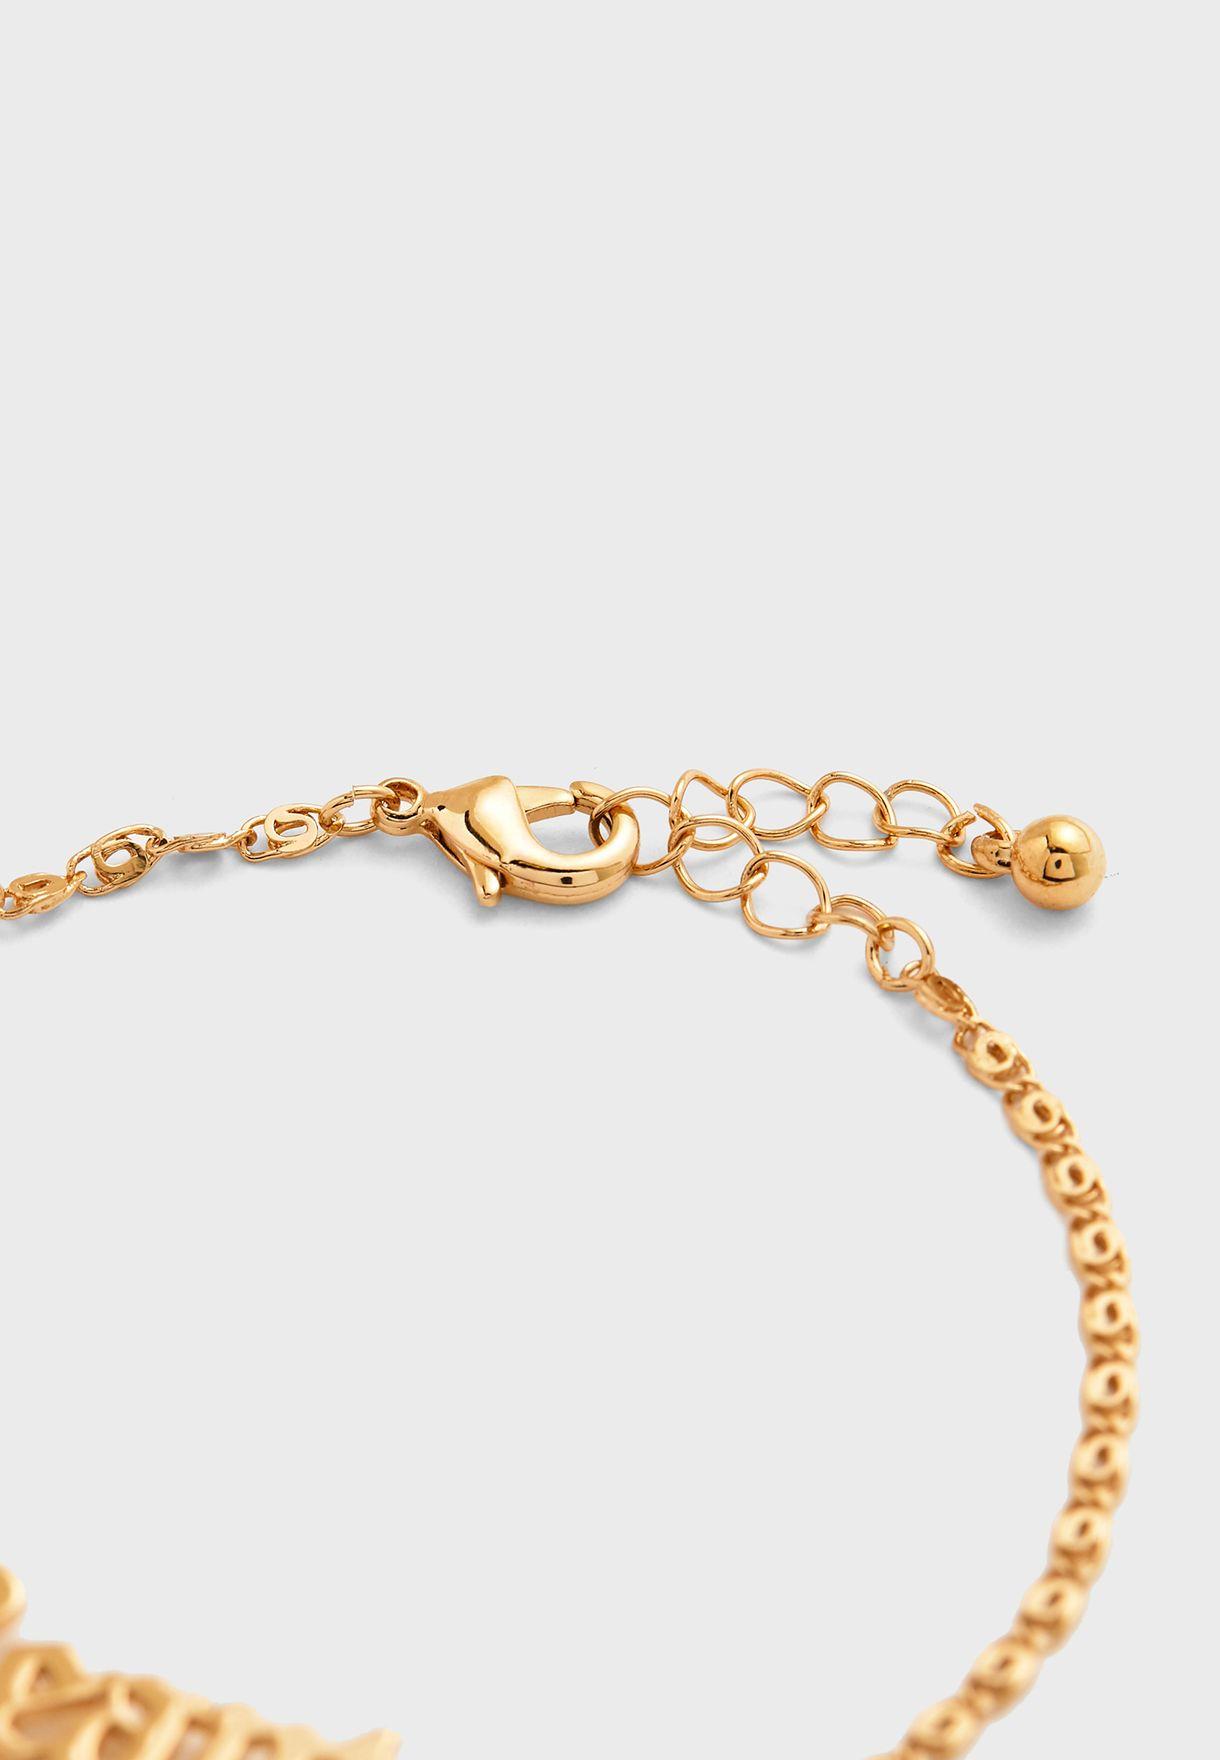 Beauty Pendant Chain Bracelet